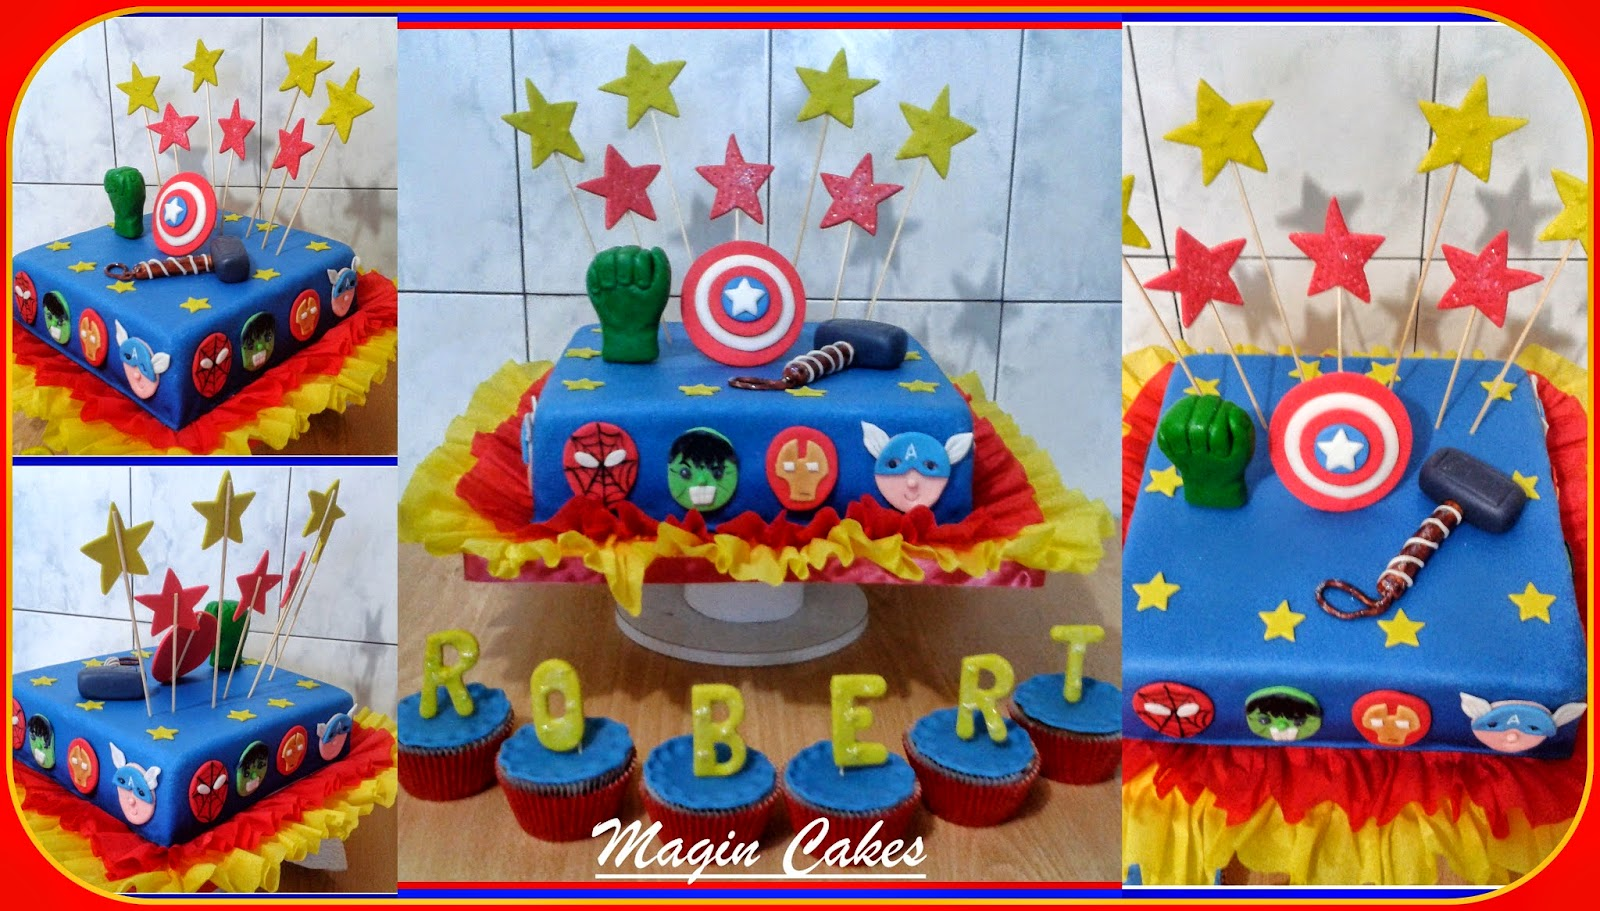 Magin Cakes Torta Avengers Watermelon Wallpaper Rainbow Find Free HD for Desktop [freshlhys.tk]